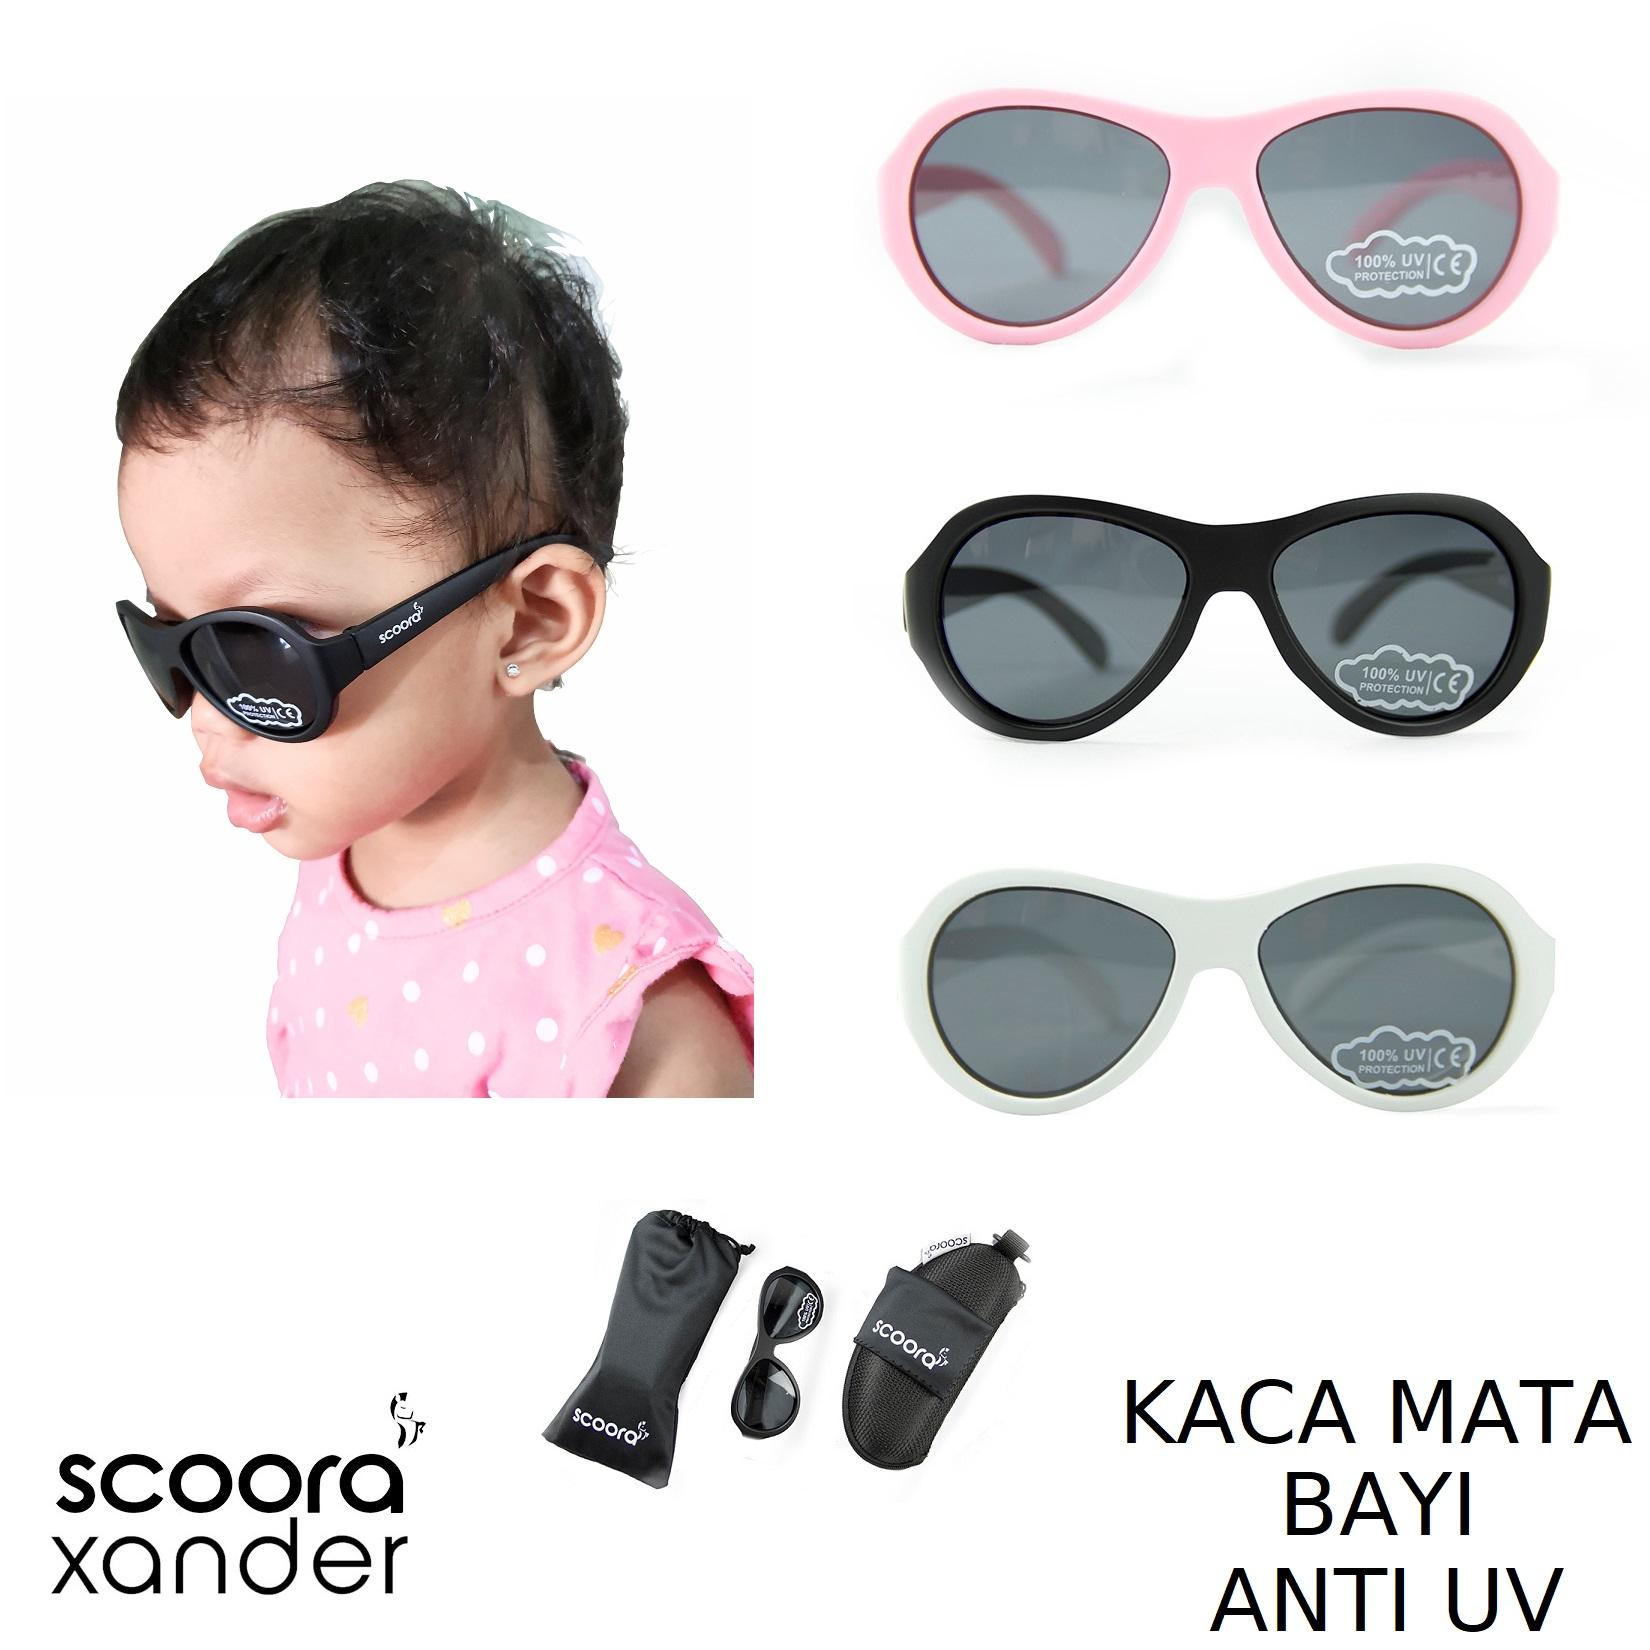 Scoora Xander Kaca Mata Bayi Anti UV (1)